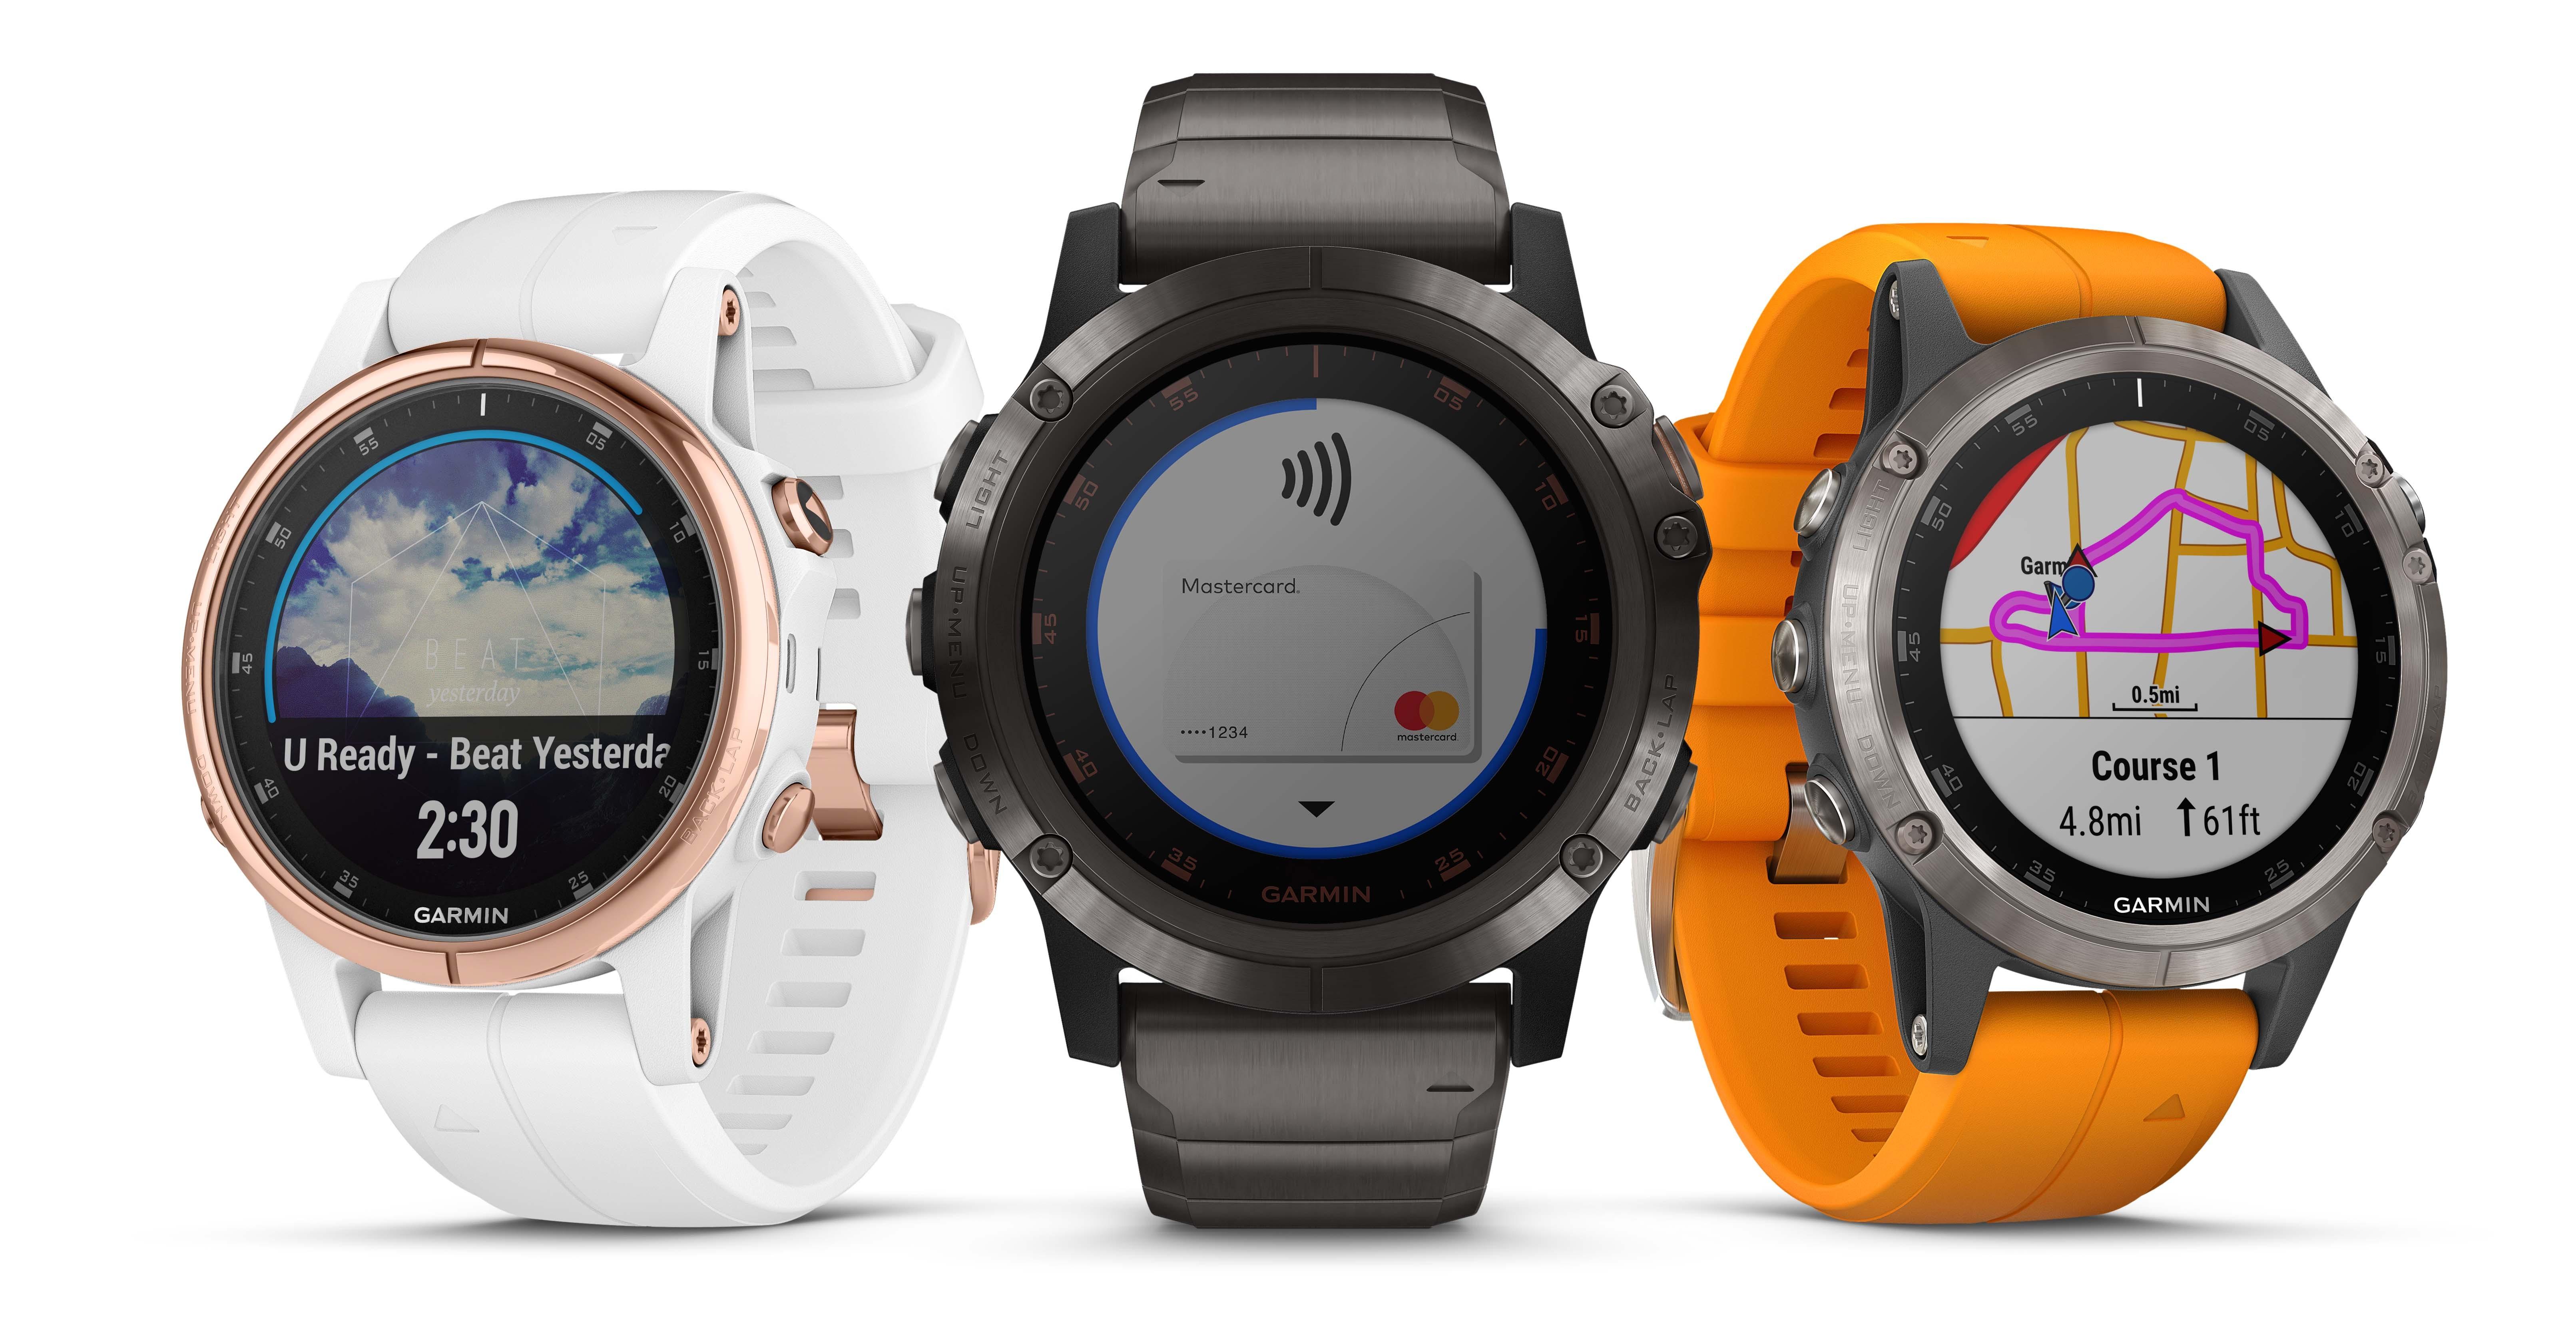 Garmin® debuts the fēnix® 5 Plus, adds maps, music, Garmin Pay and ...